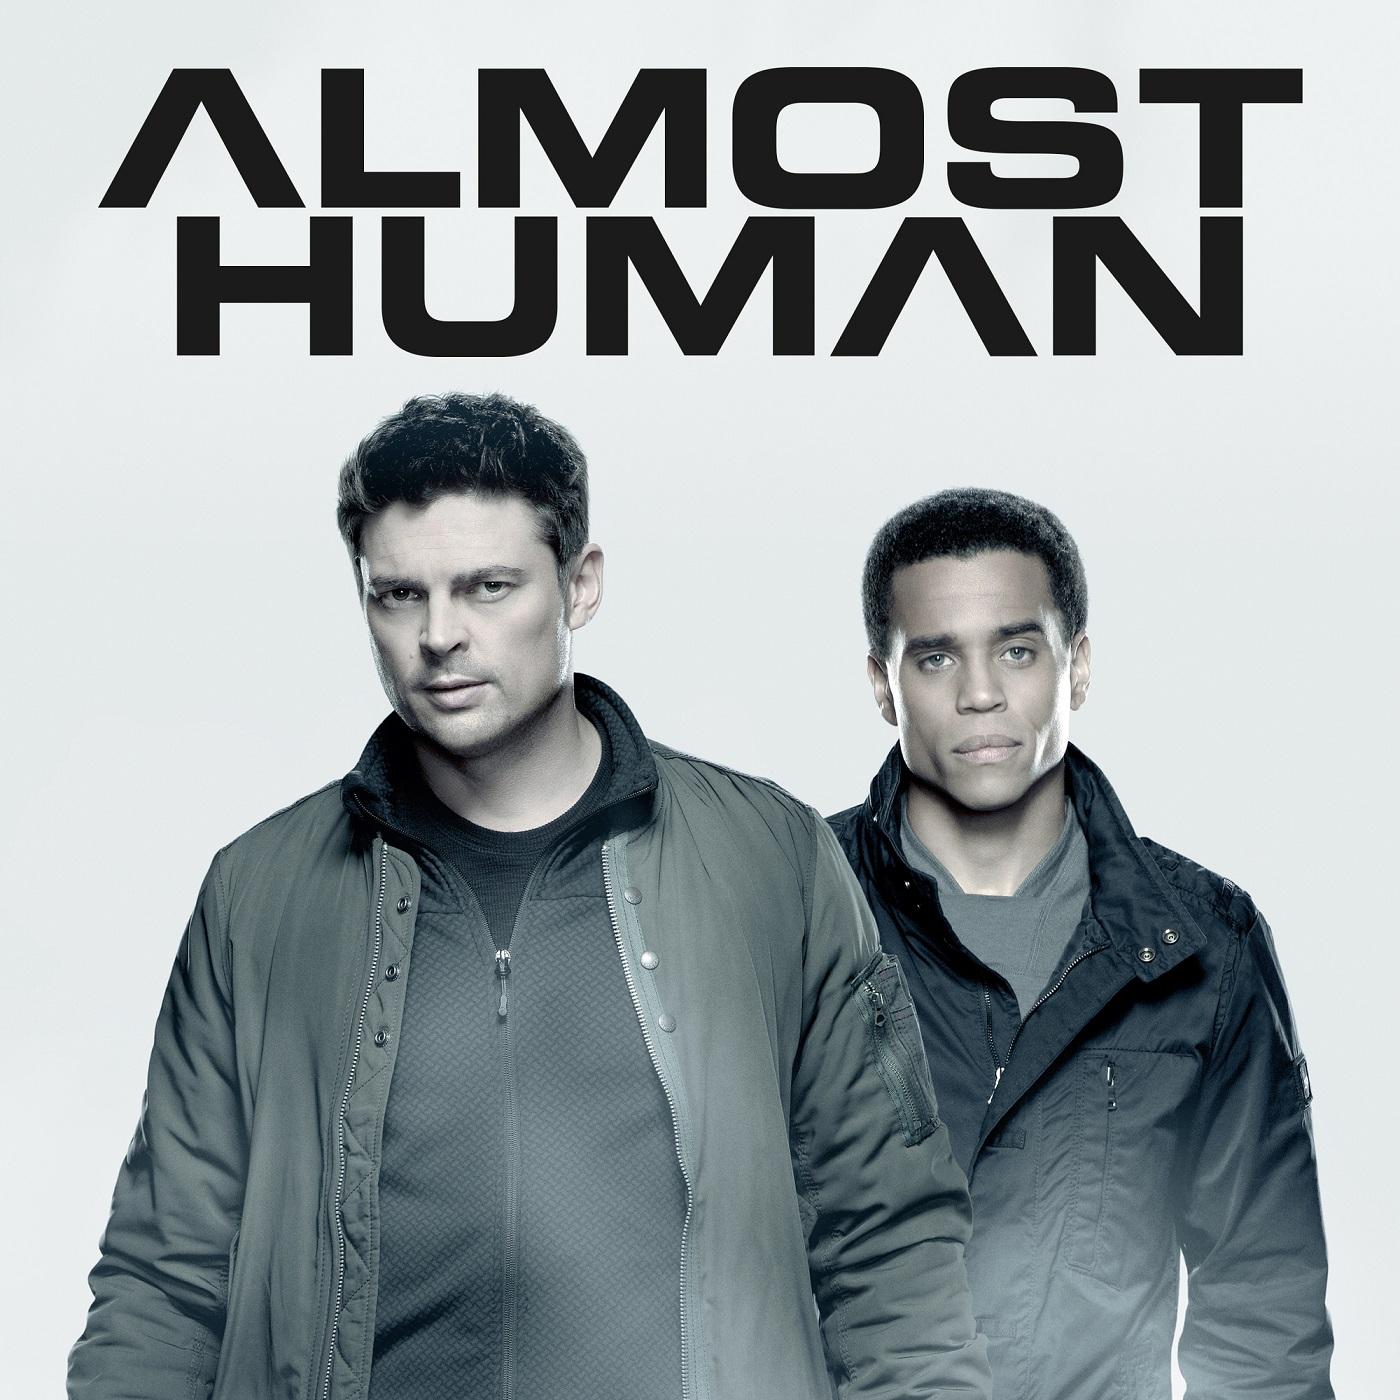 Almost Human Season 01 | S01E13 HD + Mp4 Kcqf